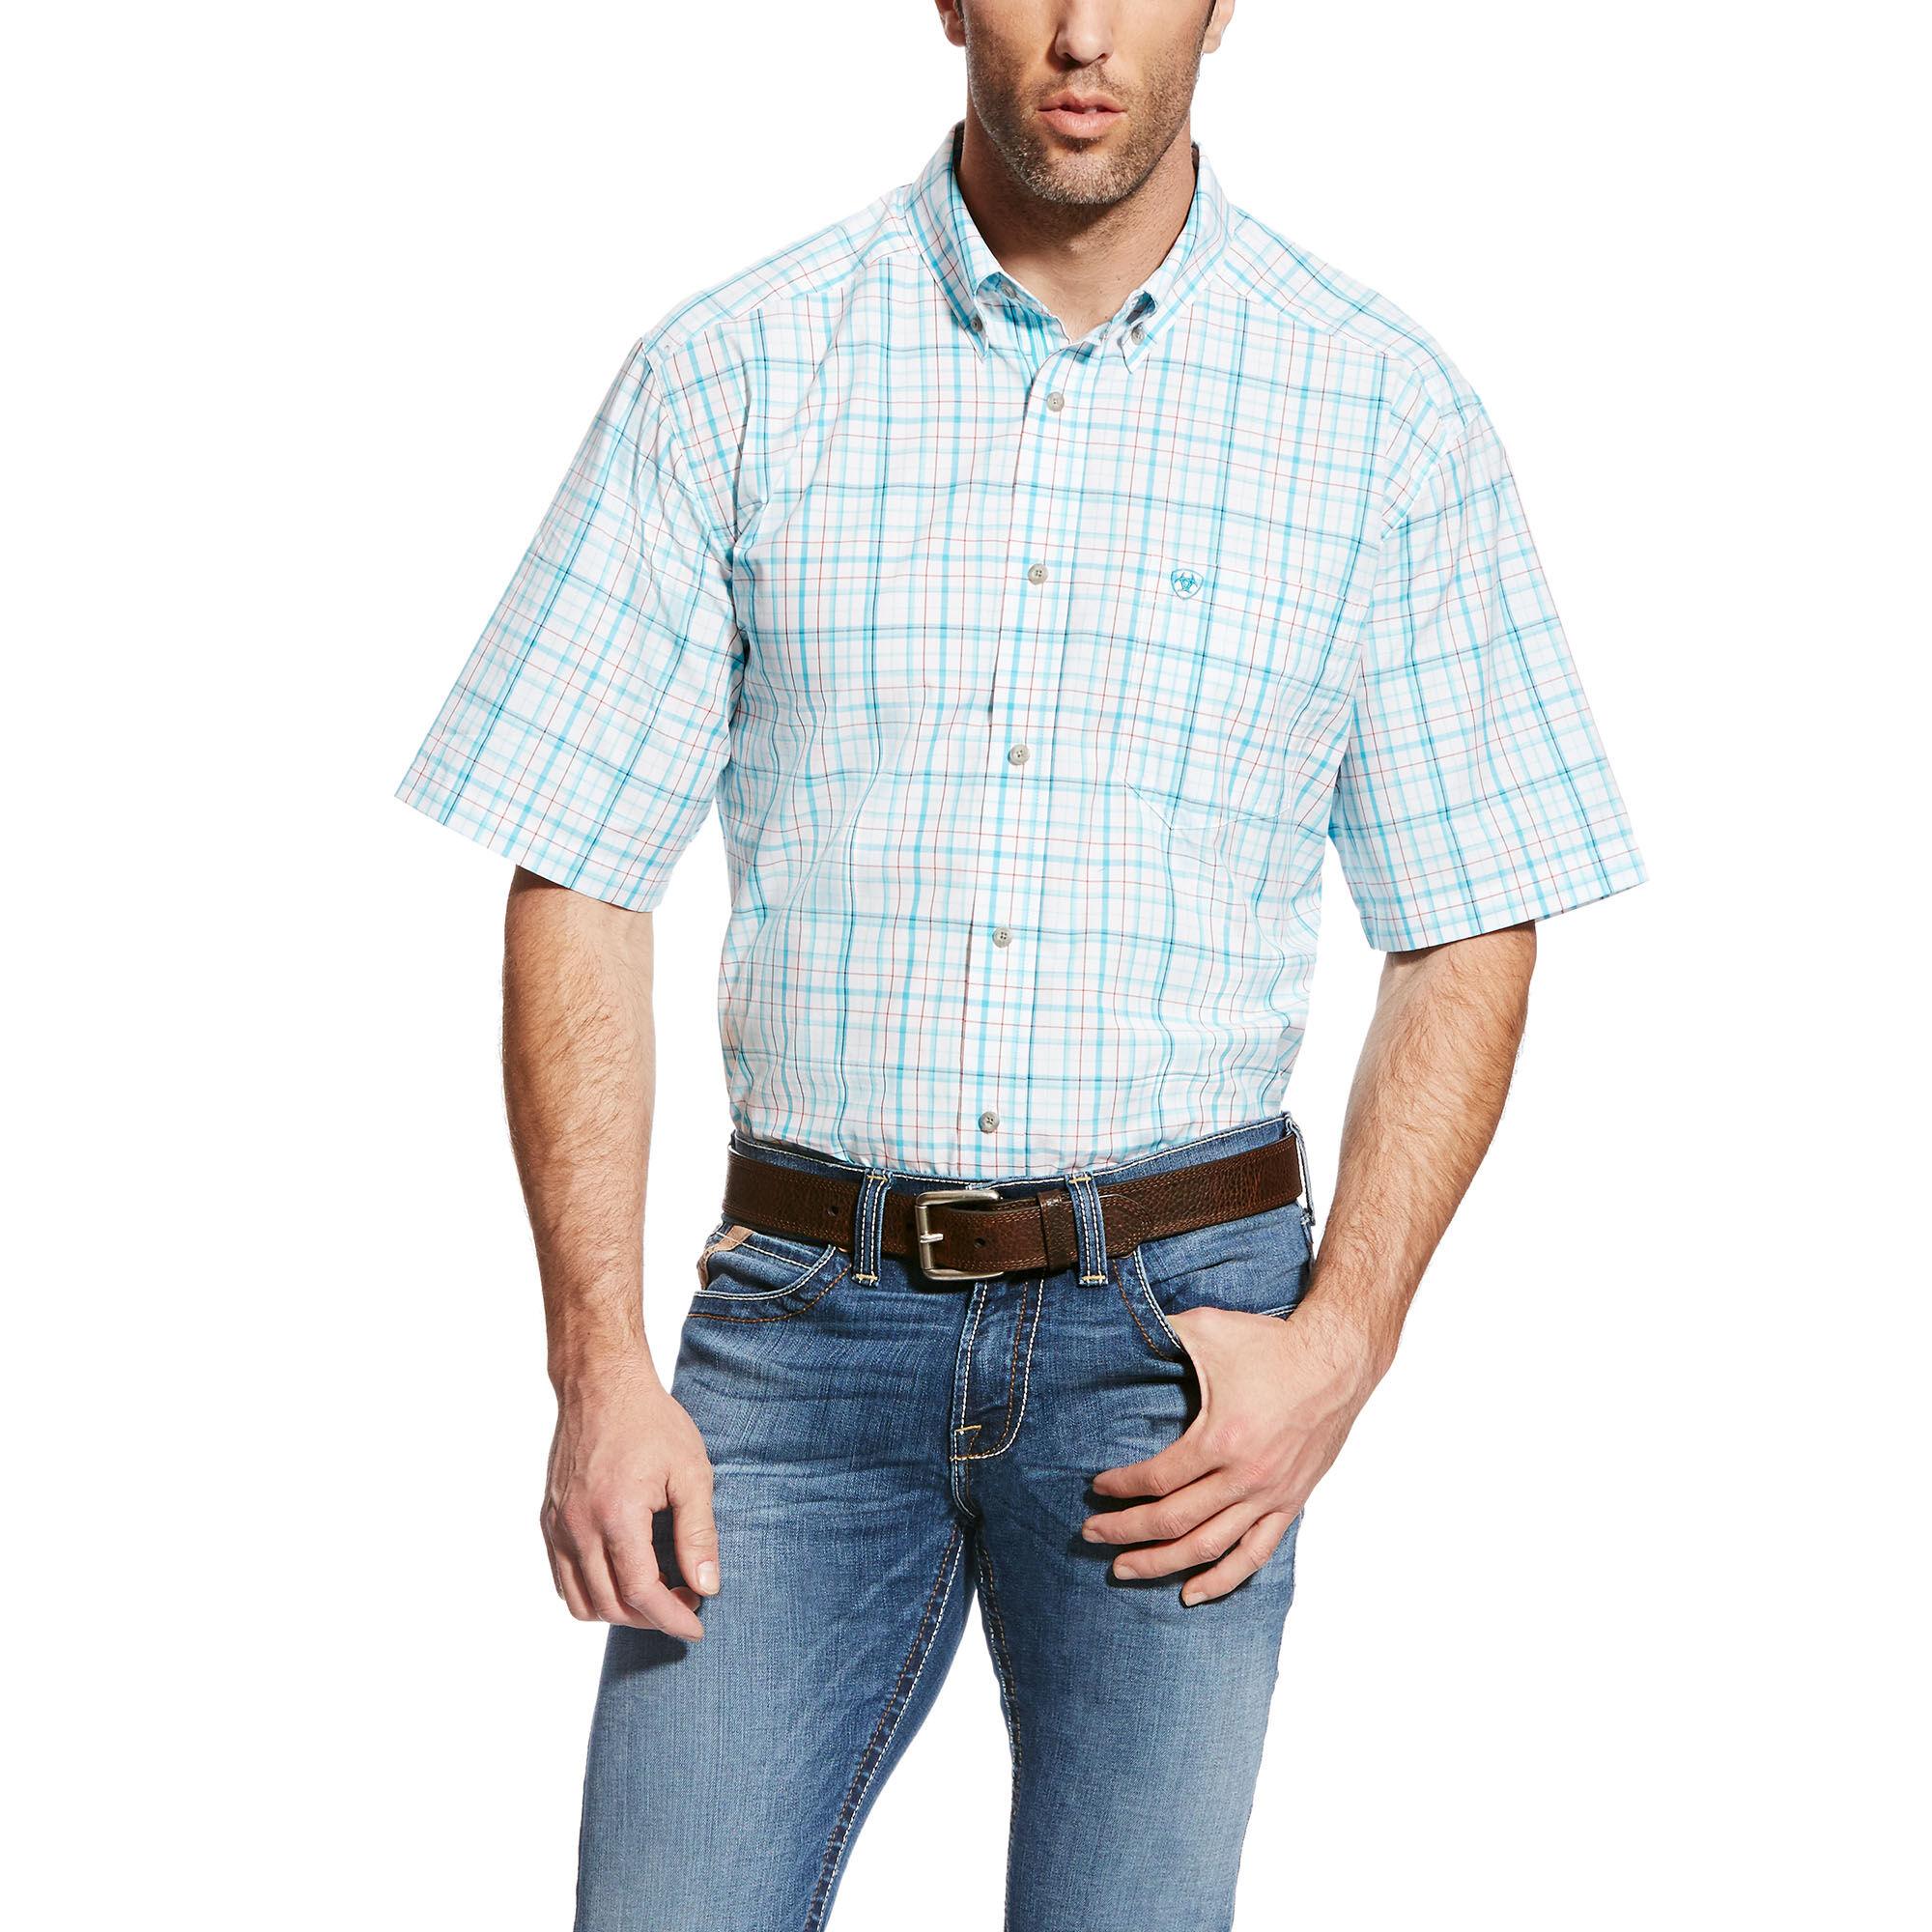 Pro Series Griffin Shirt